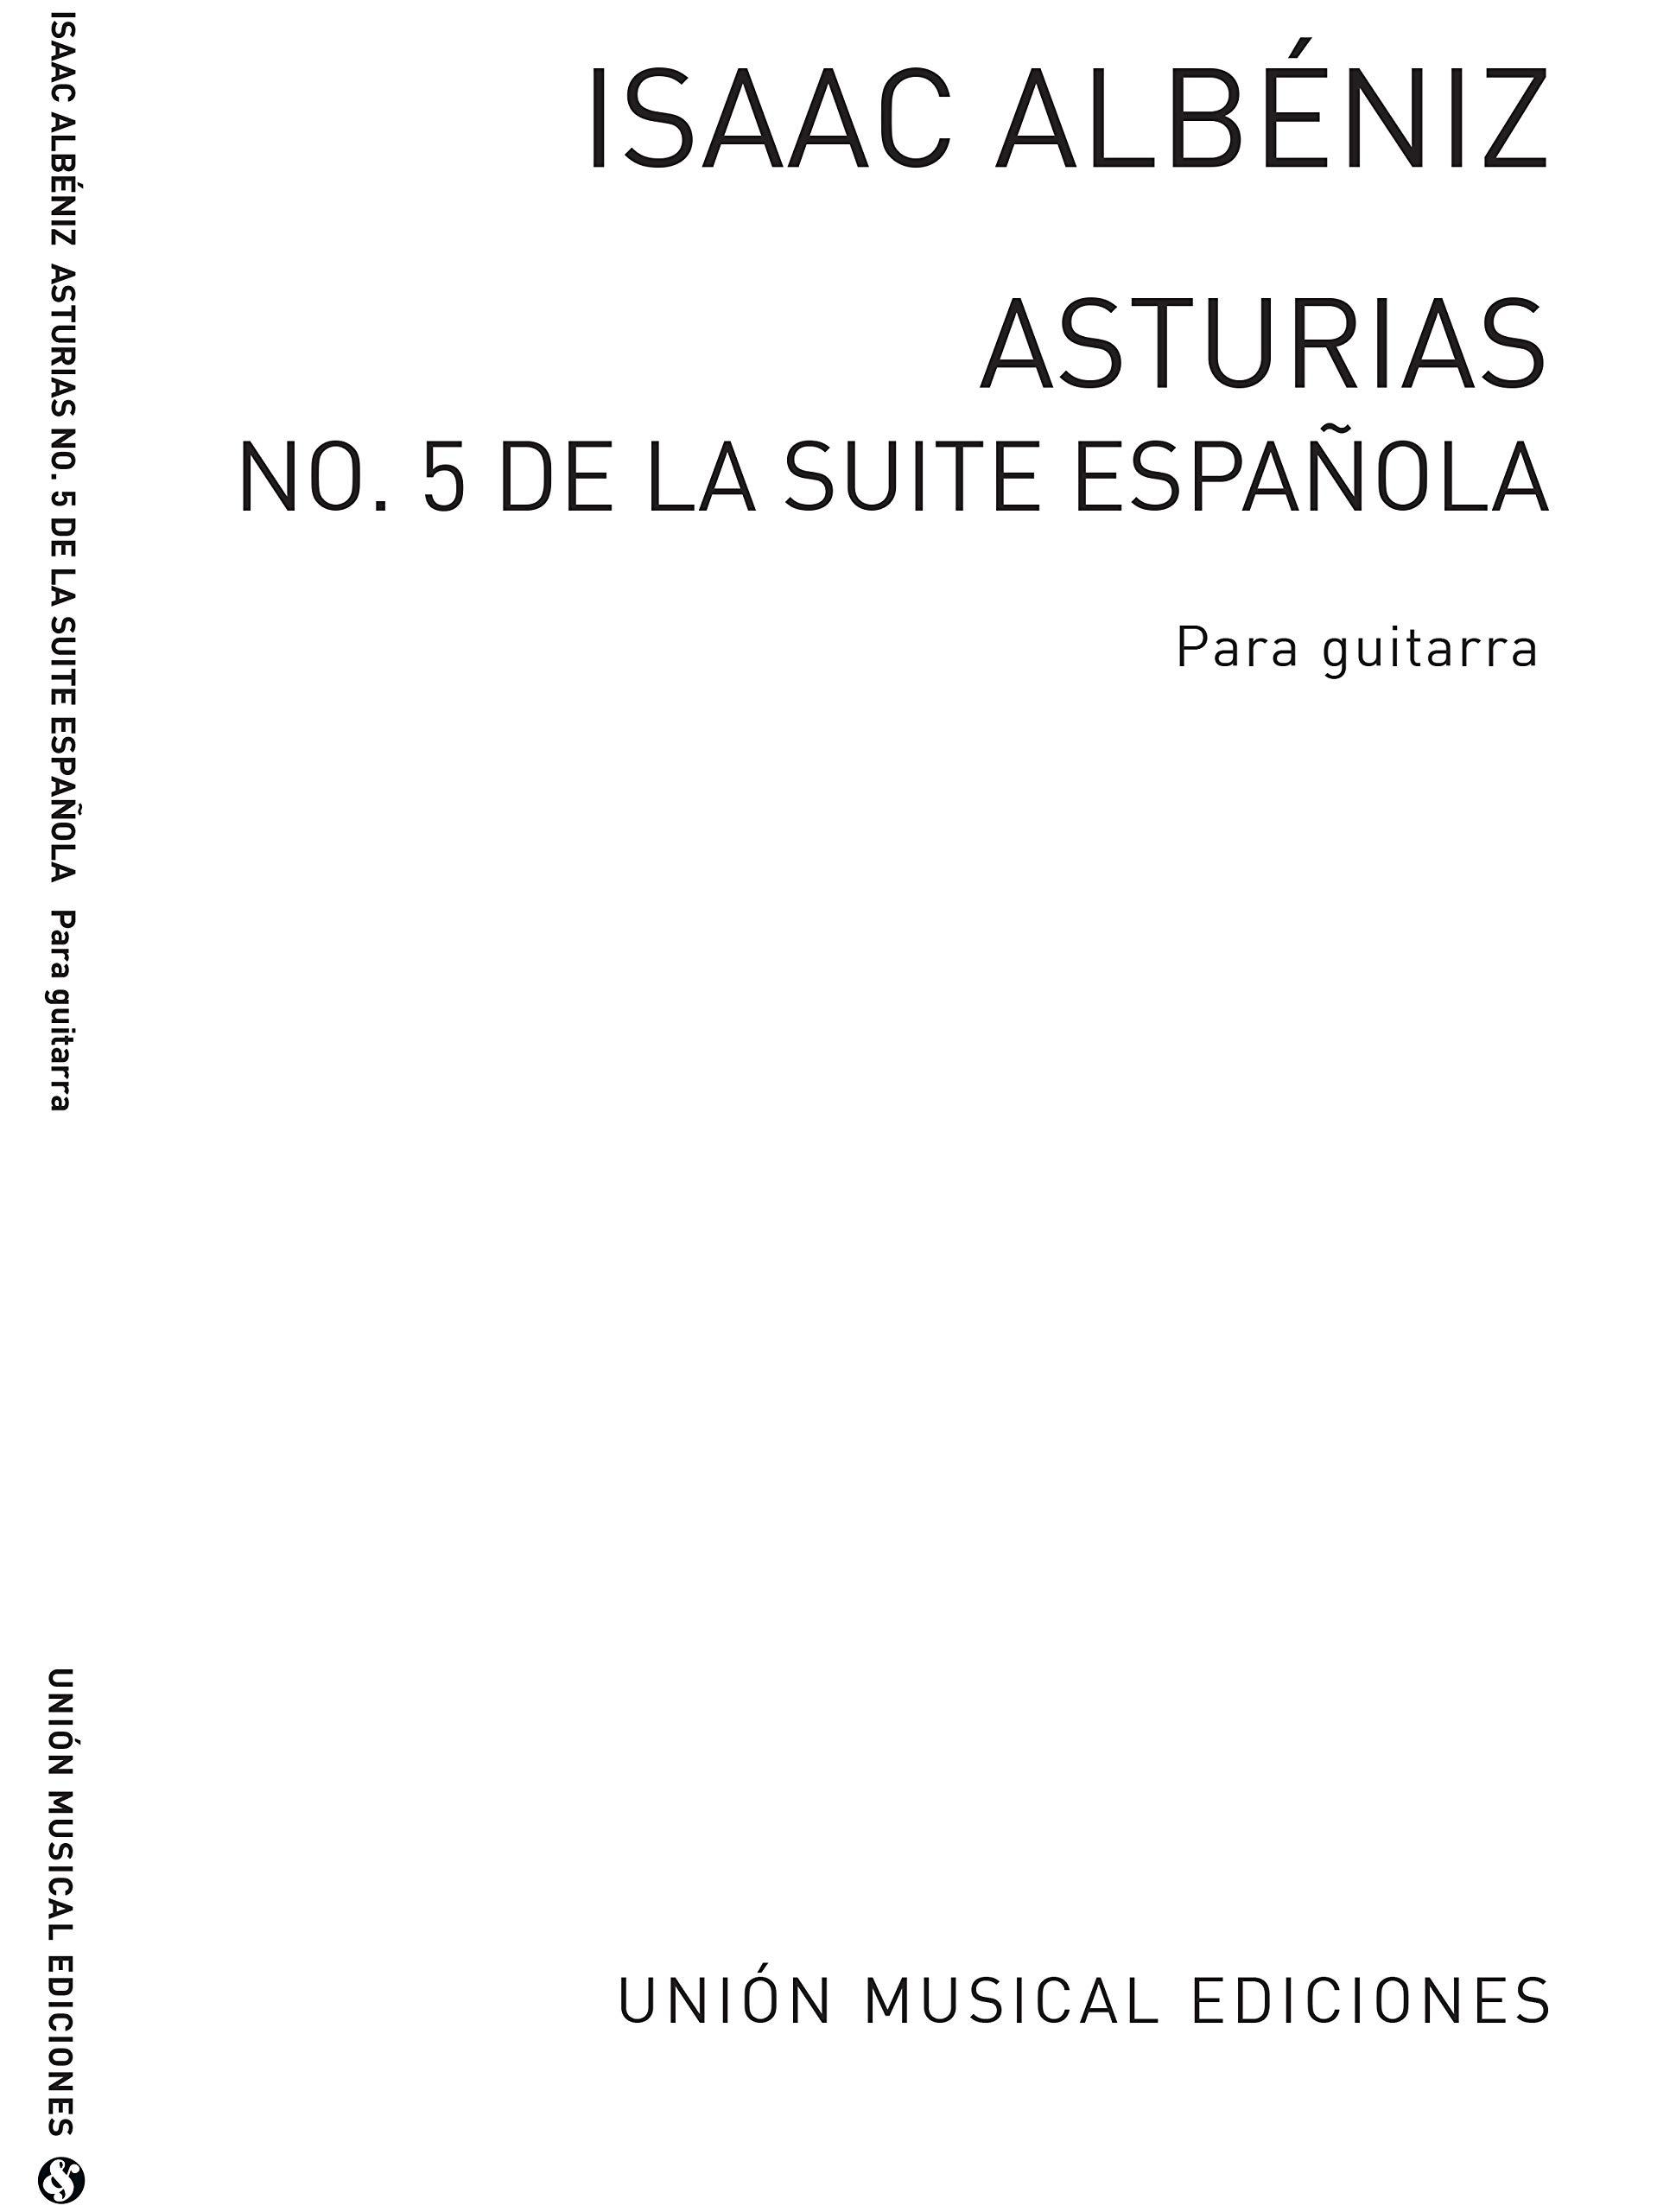 Albeniz: Asturias Leyanda No.5 from Suite Espanola Op.47 Romero ...